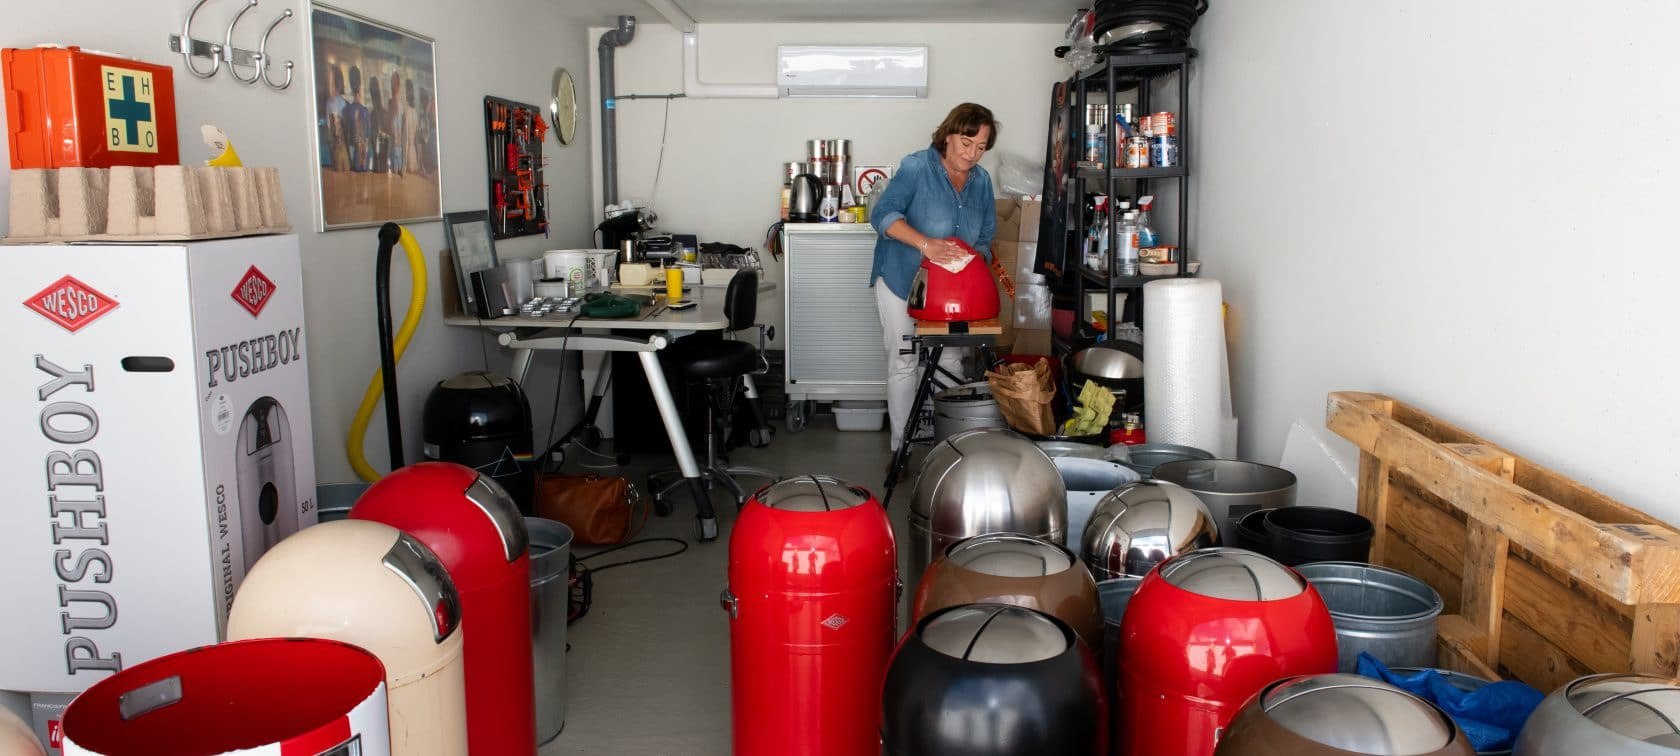 GaragePark opslag- en werkruimte - Garageboxen